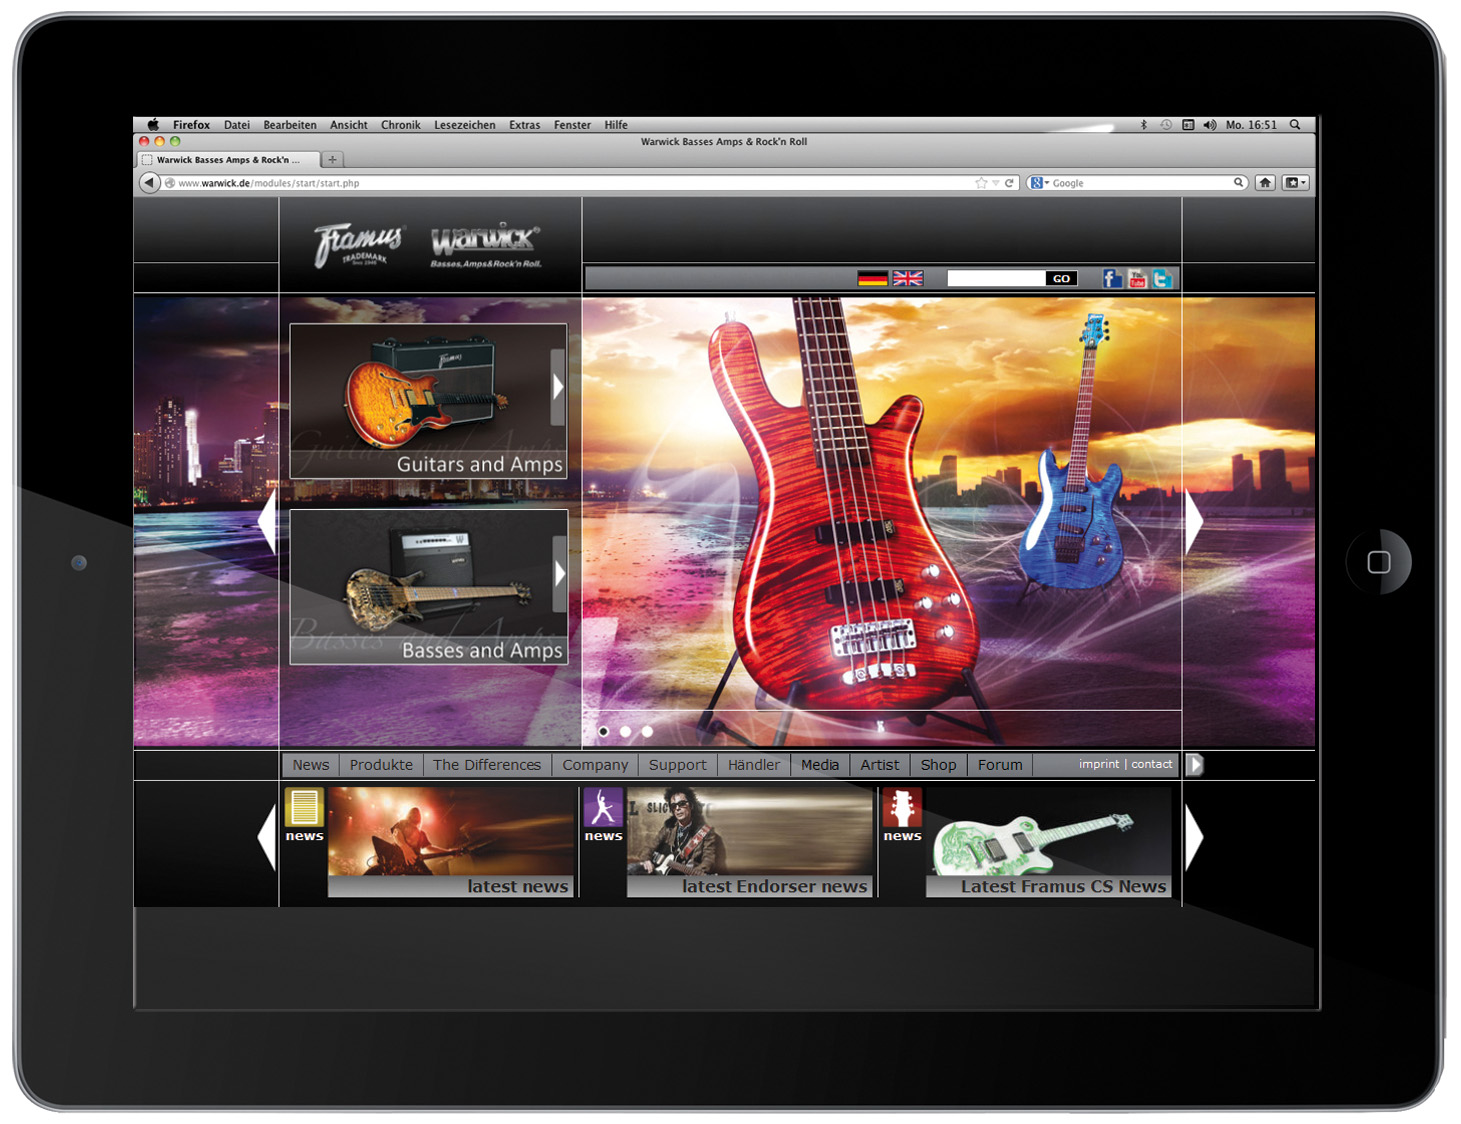 Warwick & Framus new website